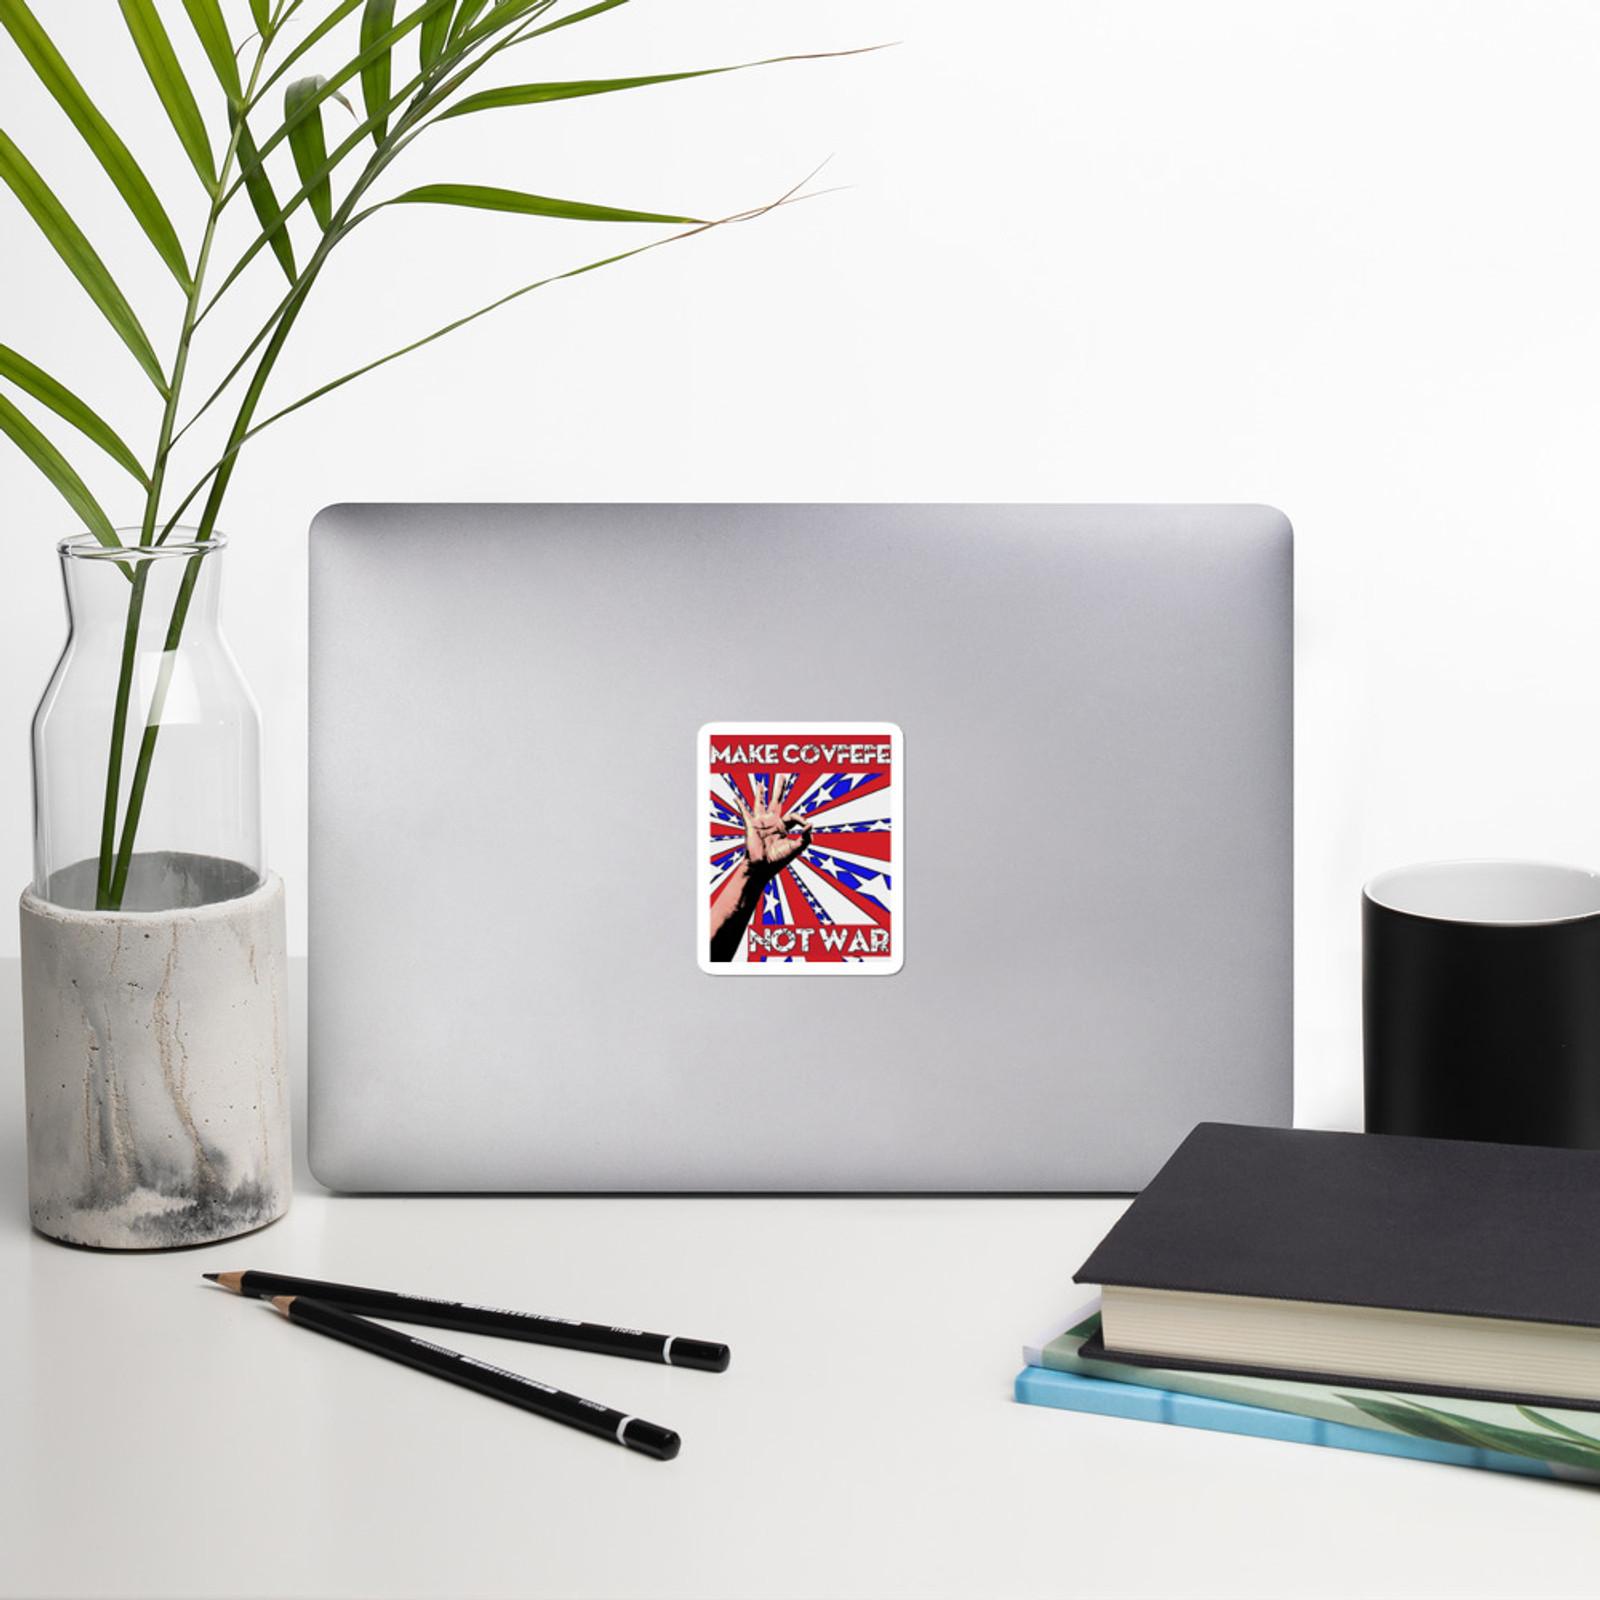 MAKE COVFEFE Stickers